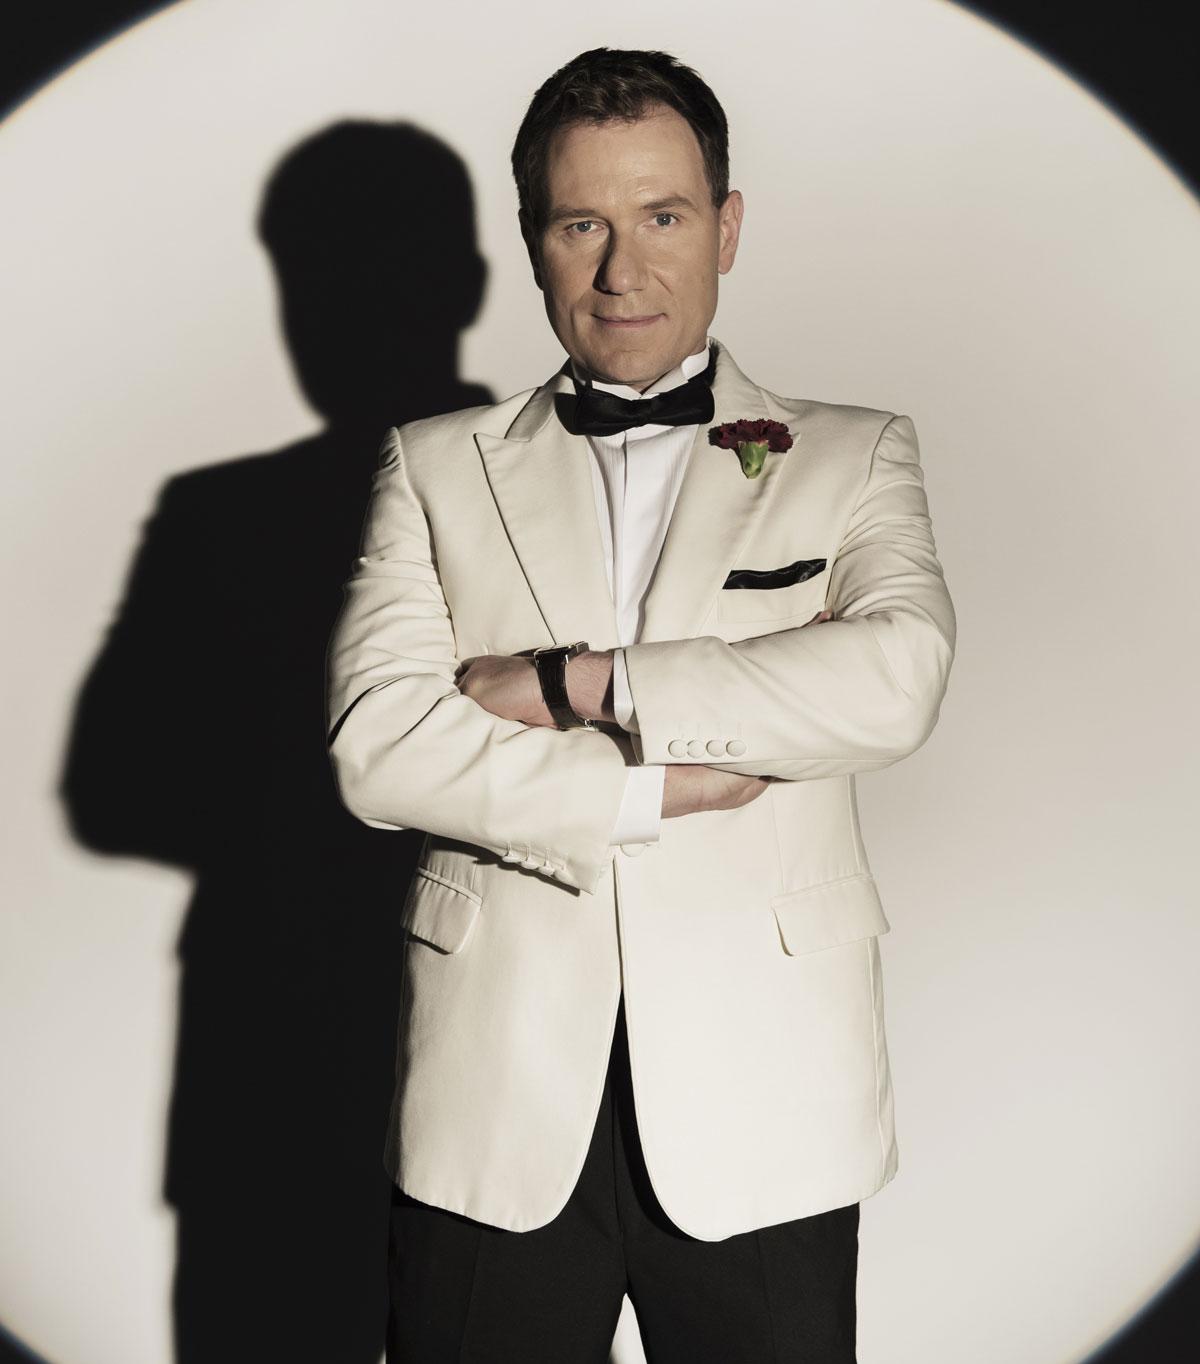 Susanna Reid Good Morning Britain Presenters Dress Up As James Bond